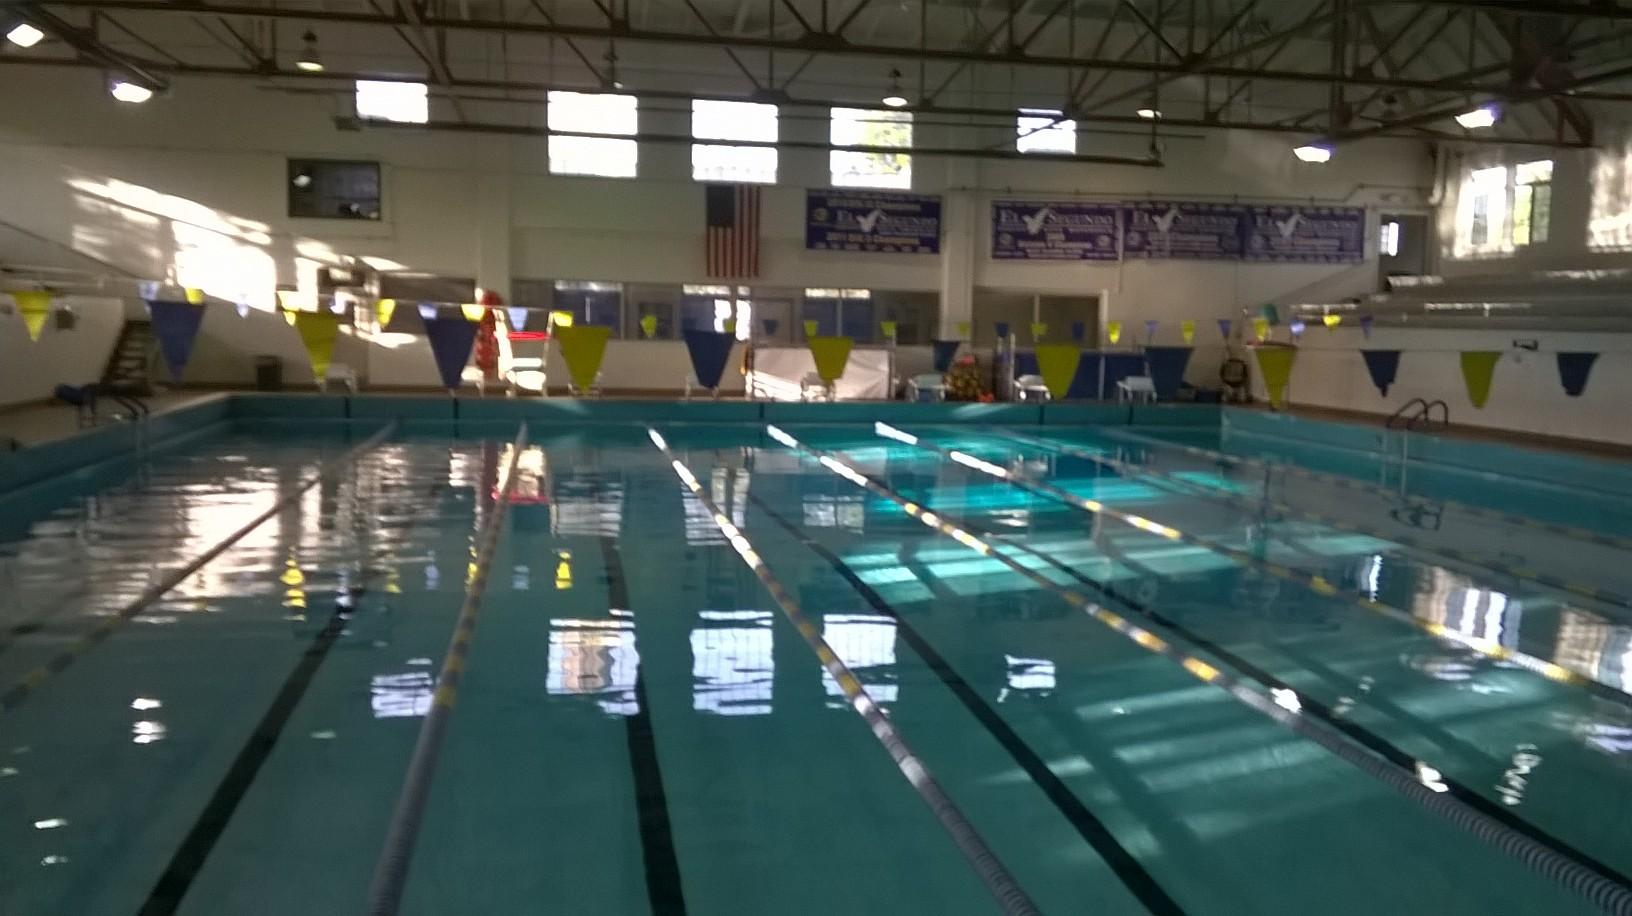 0206 - Urho Saari Swim Stadium El Segundo